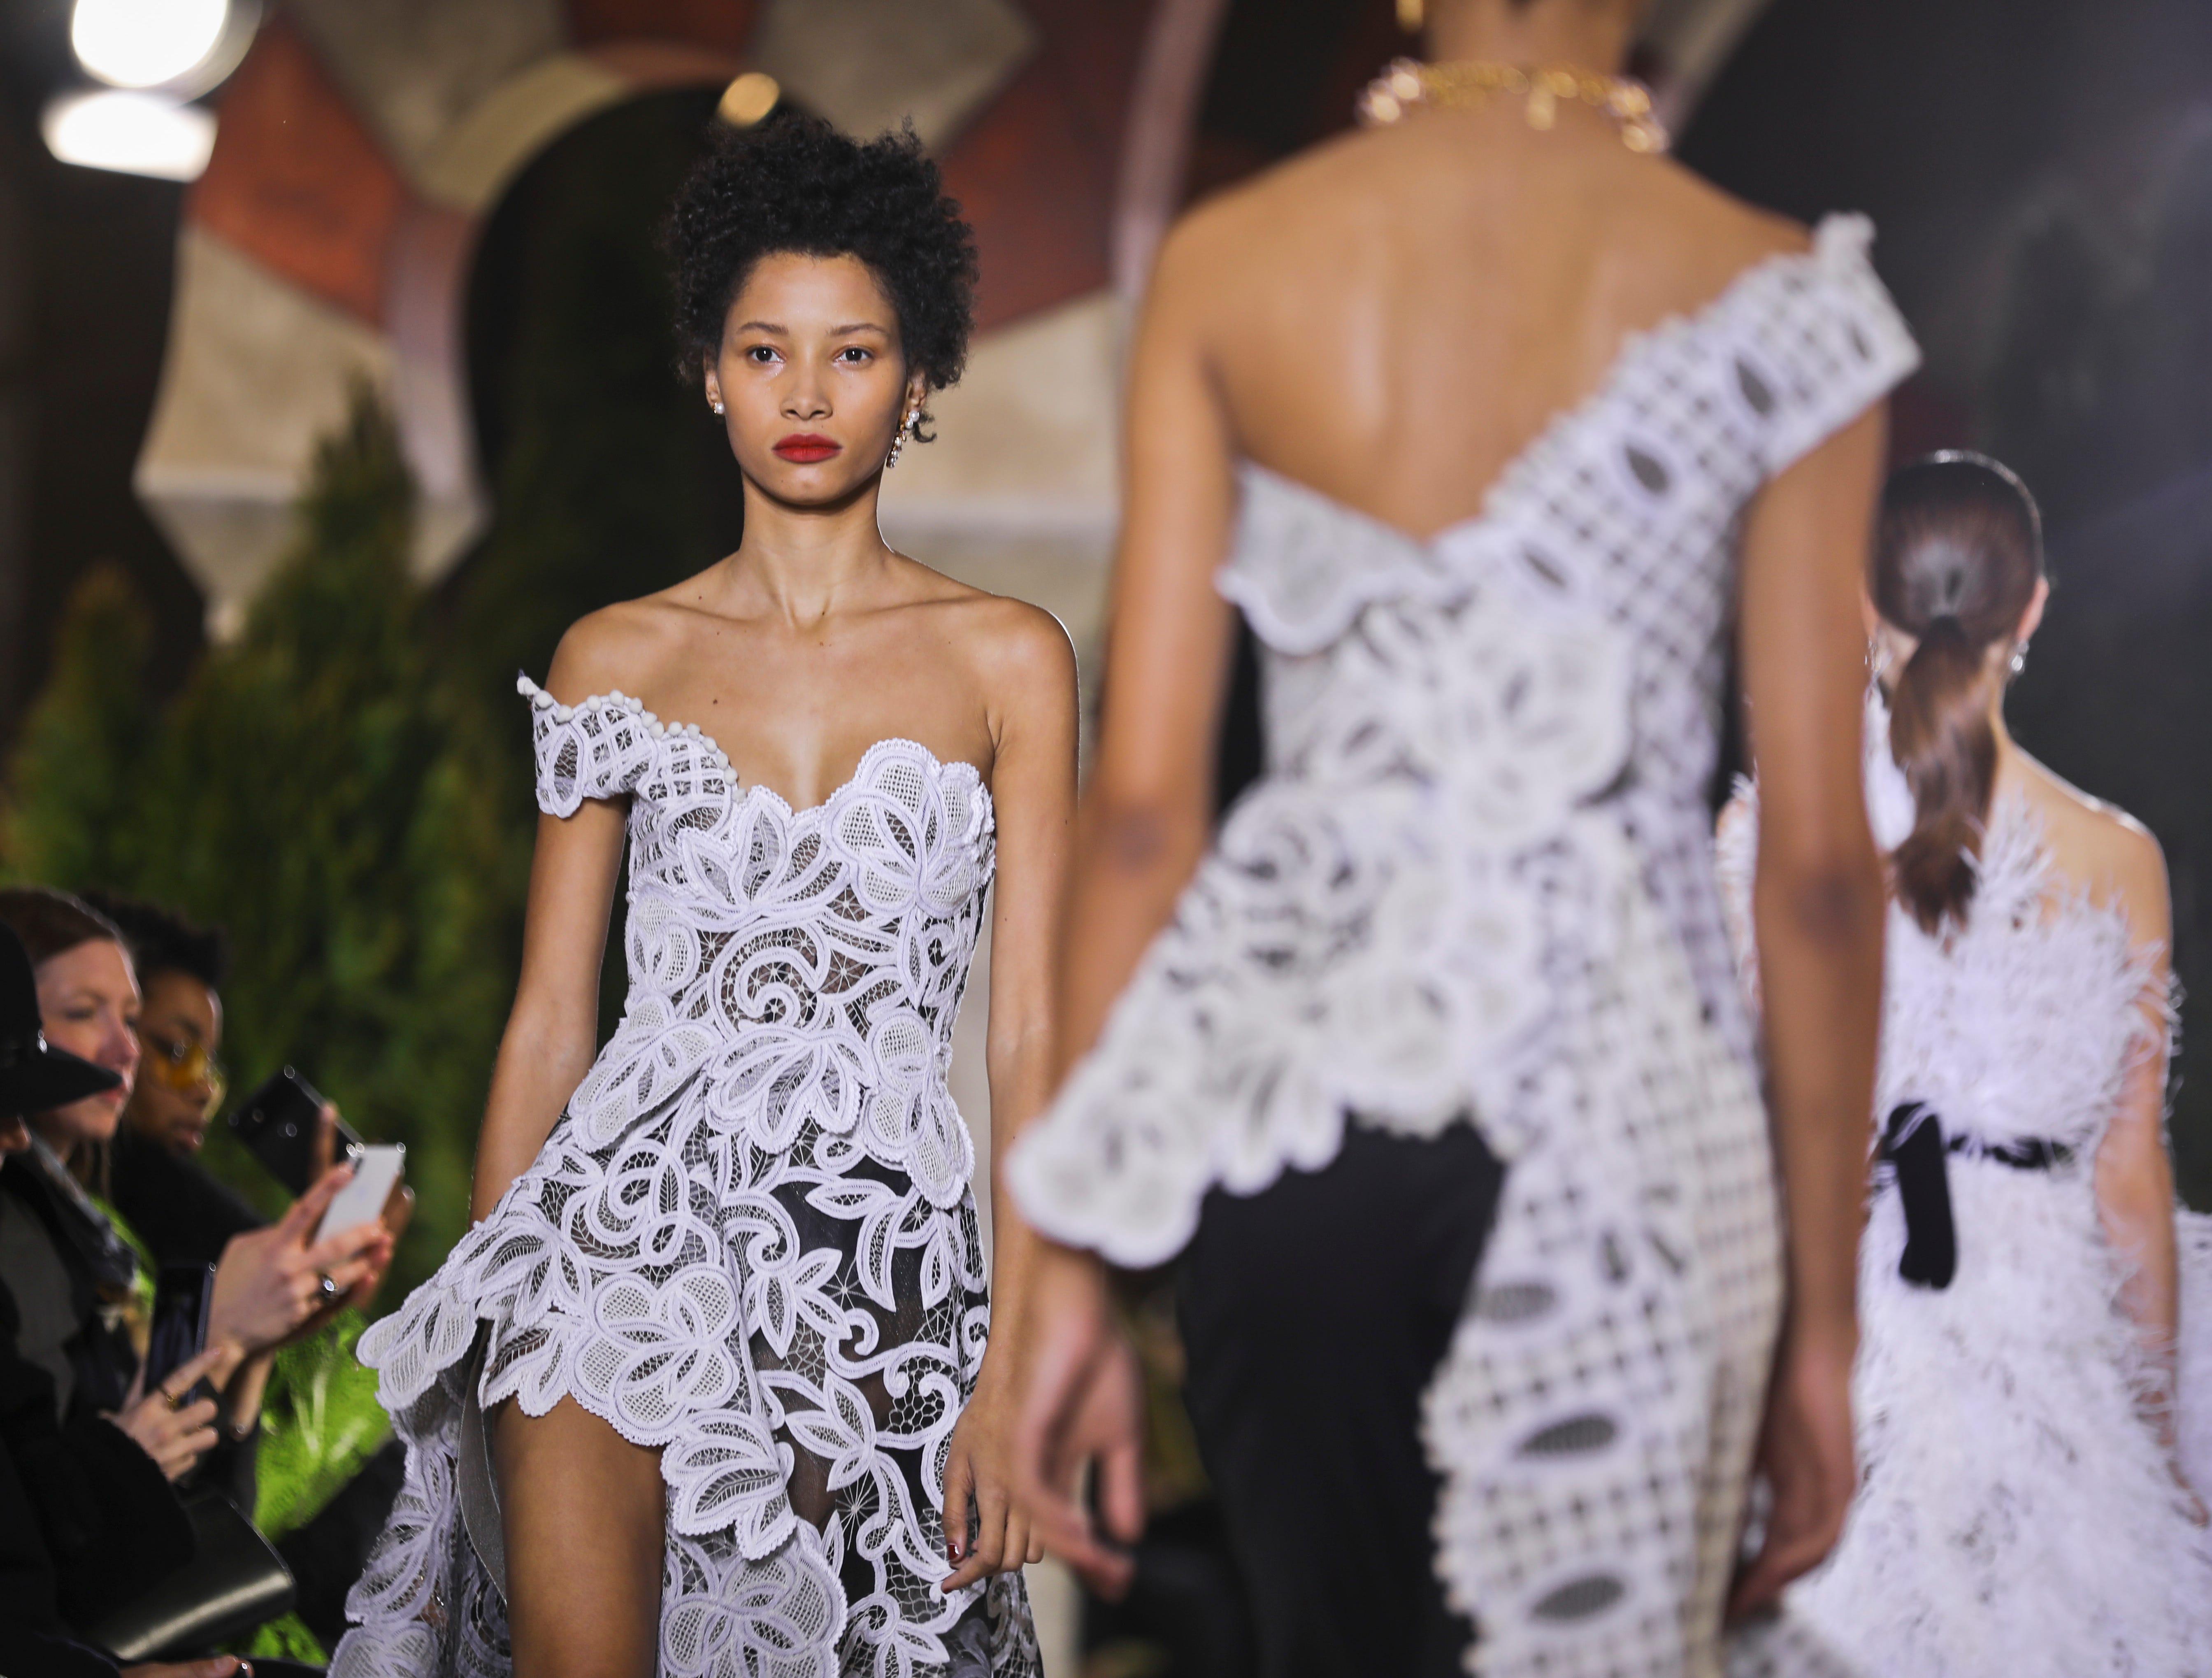 Fashion from the Oscar de la Renta collection is modeled during New York Fashion Week, Tuesday Feb. 12, 2019. (AP Photo/Bebeto Matthews) ORG XMIT: NYBM127